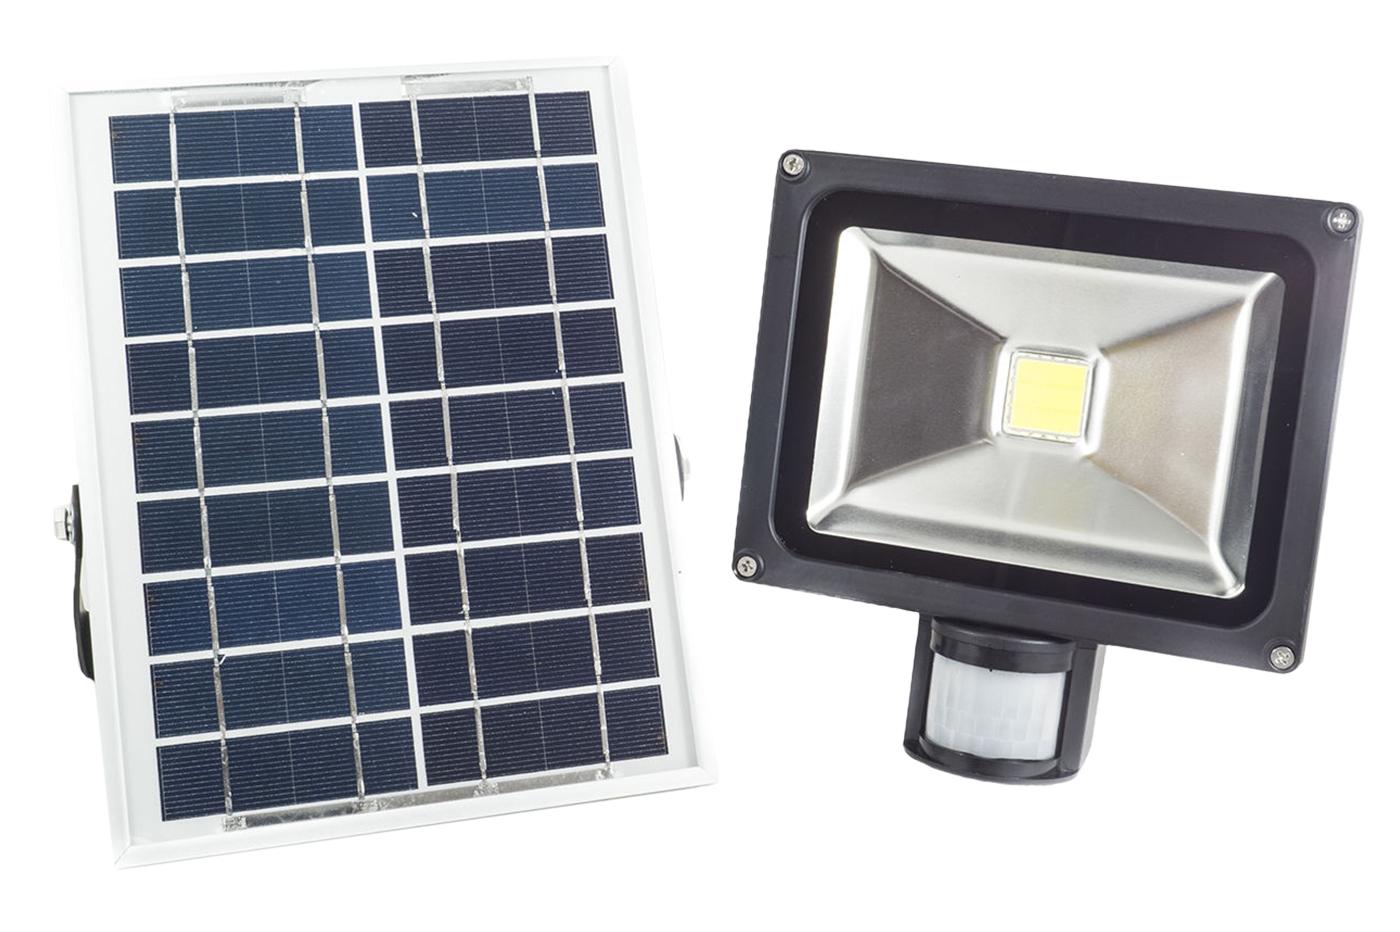 Bes illuminazione ad energia solare beselettronica kit